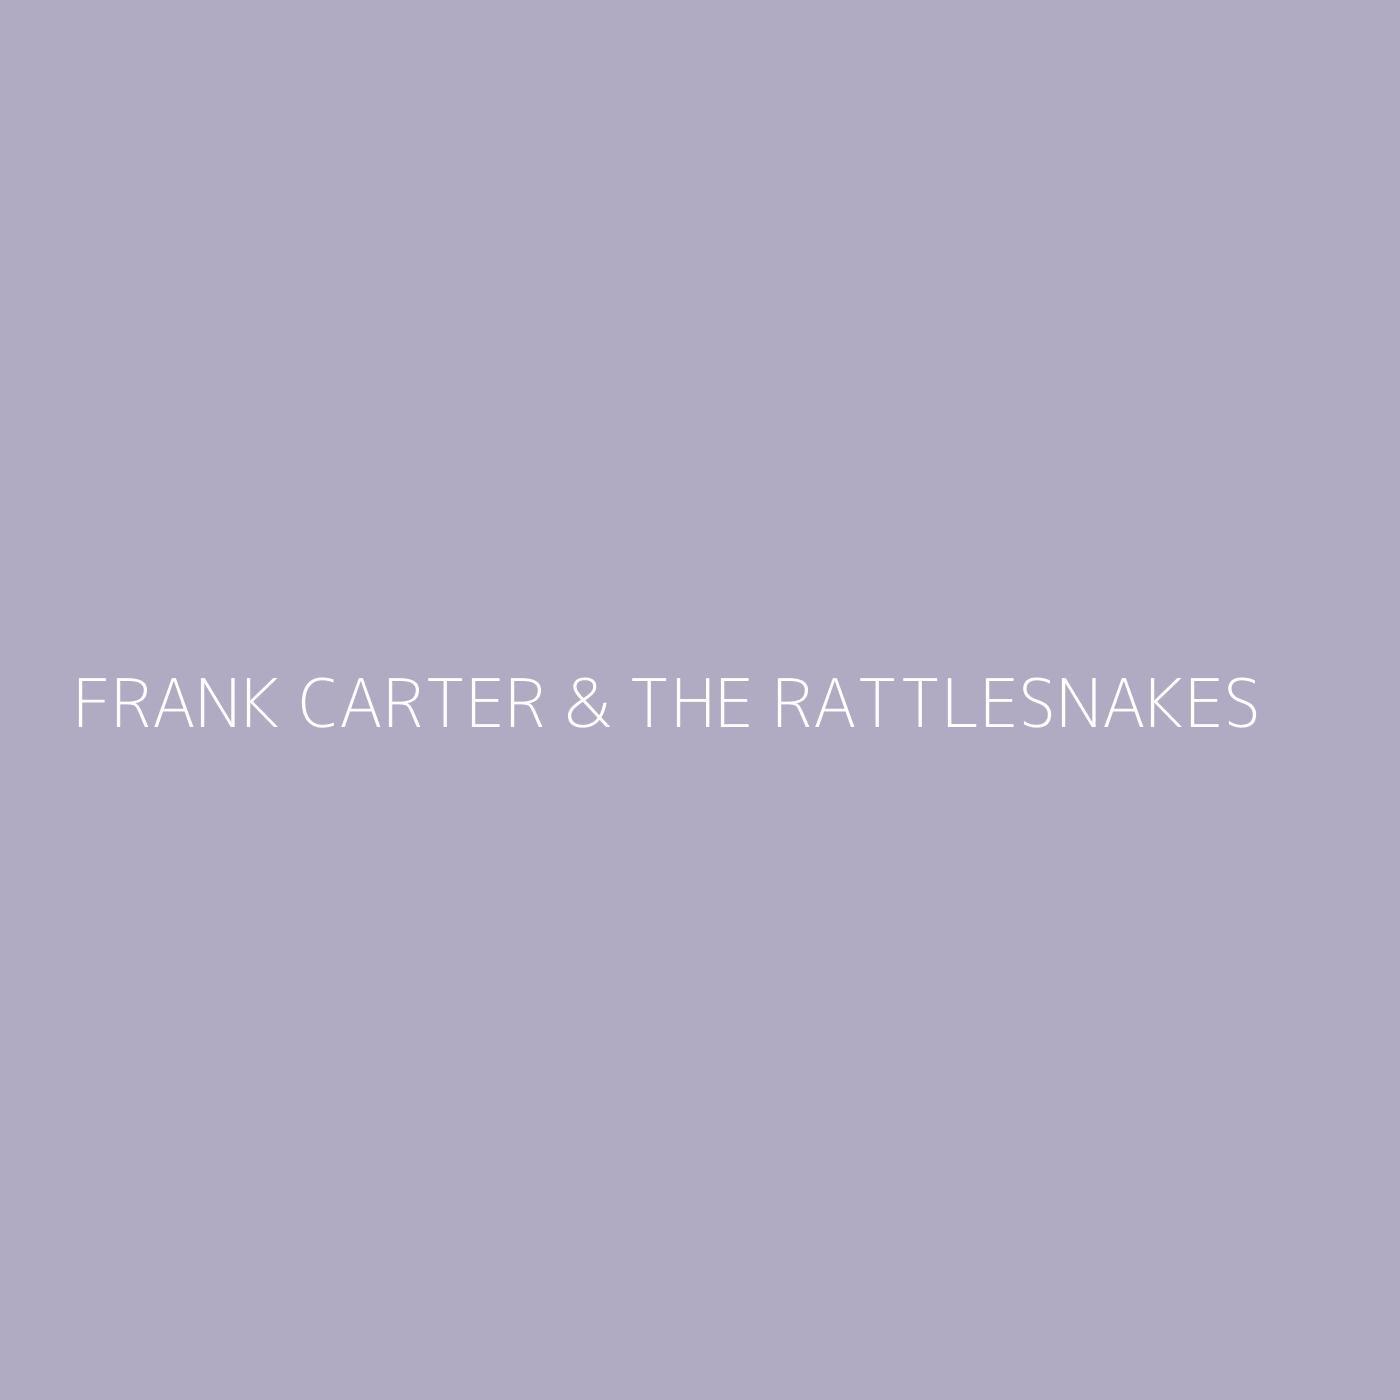 Frank Carter & The Rattlesnakes Playlist Artwork